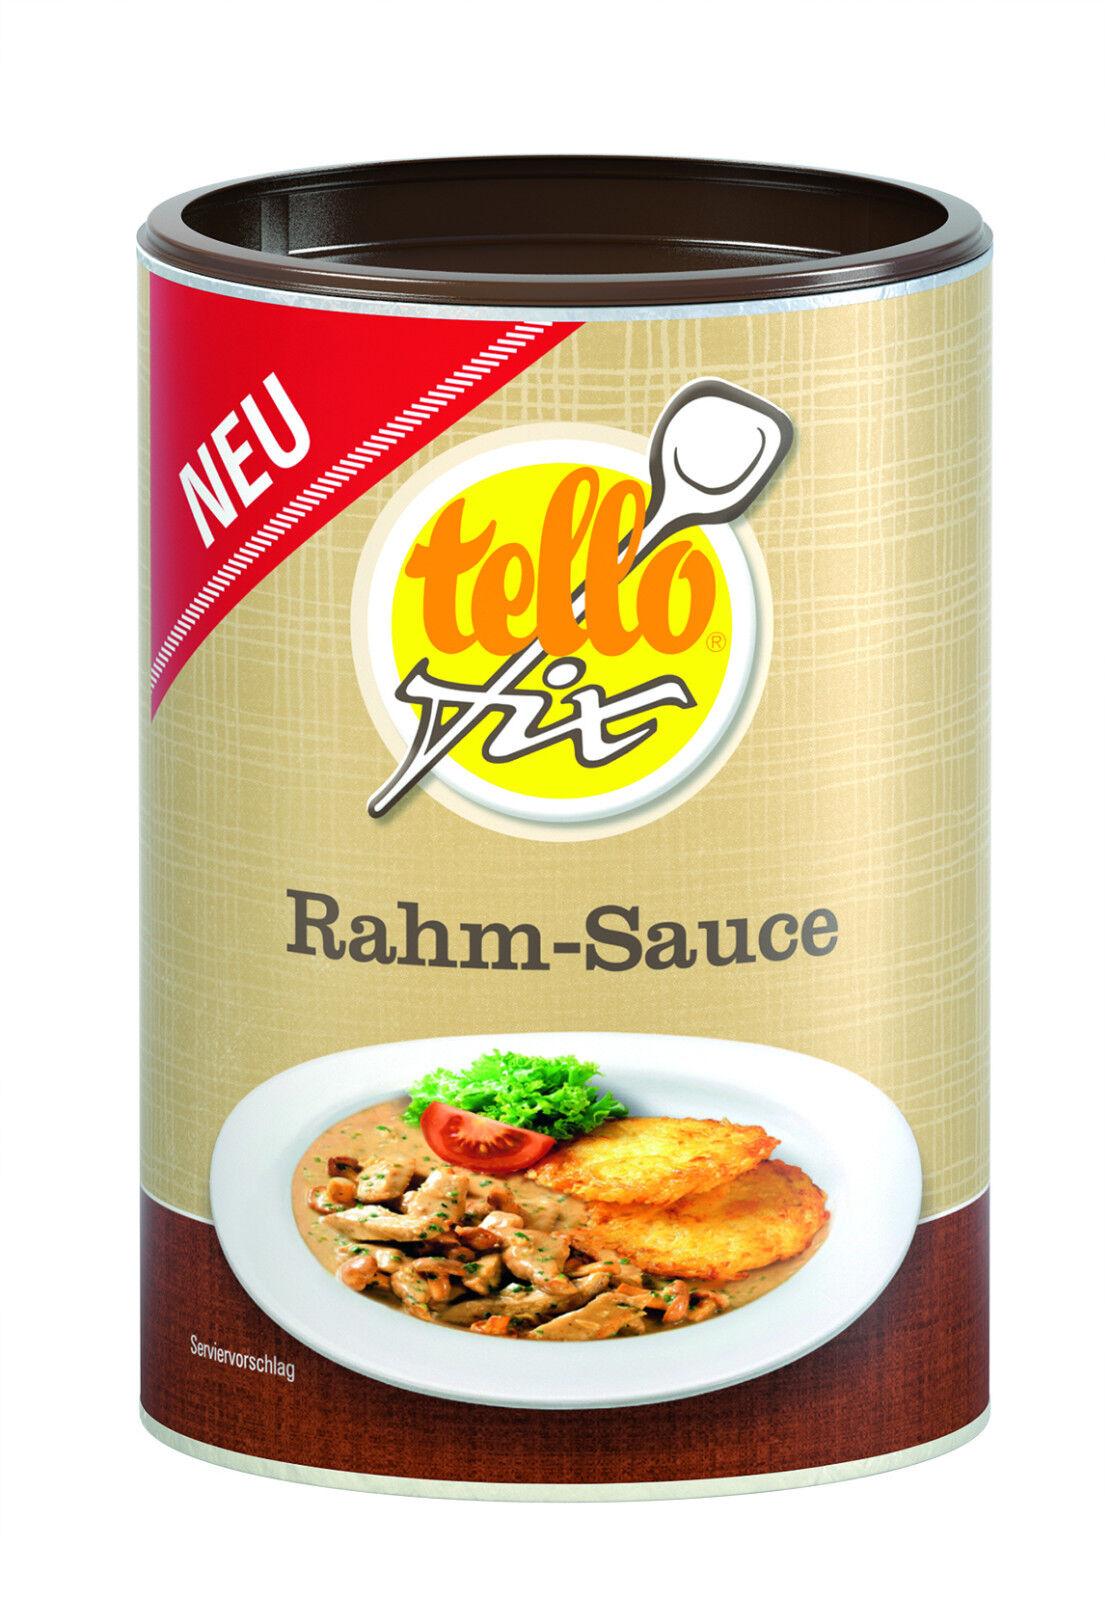 (EUR 17,59/kg) tellofix Rahm-Sauce helle Bratensoße o. GSV (170 g/1,5 l)